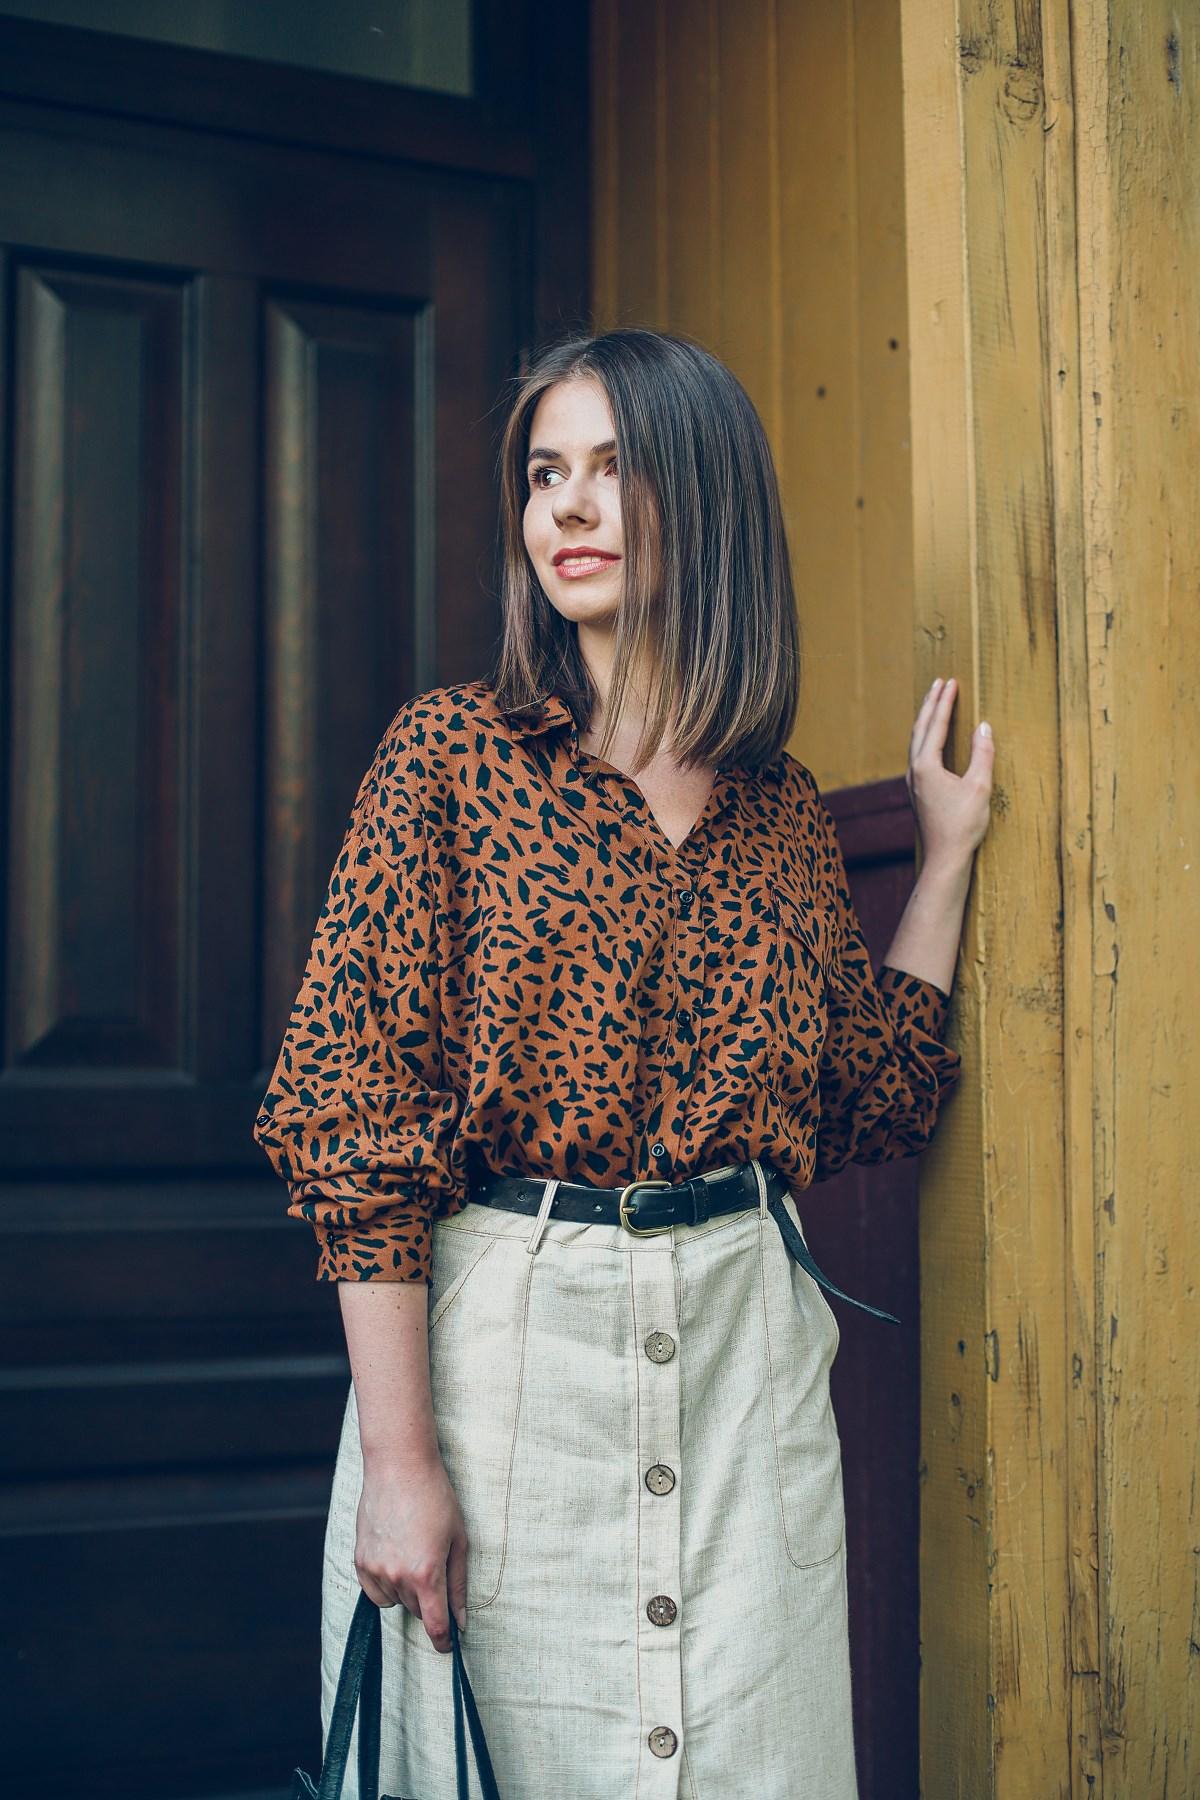 koszula w pantere spodnica lniana answear safari